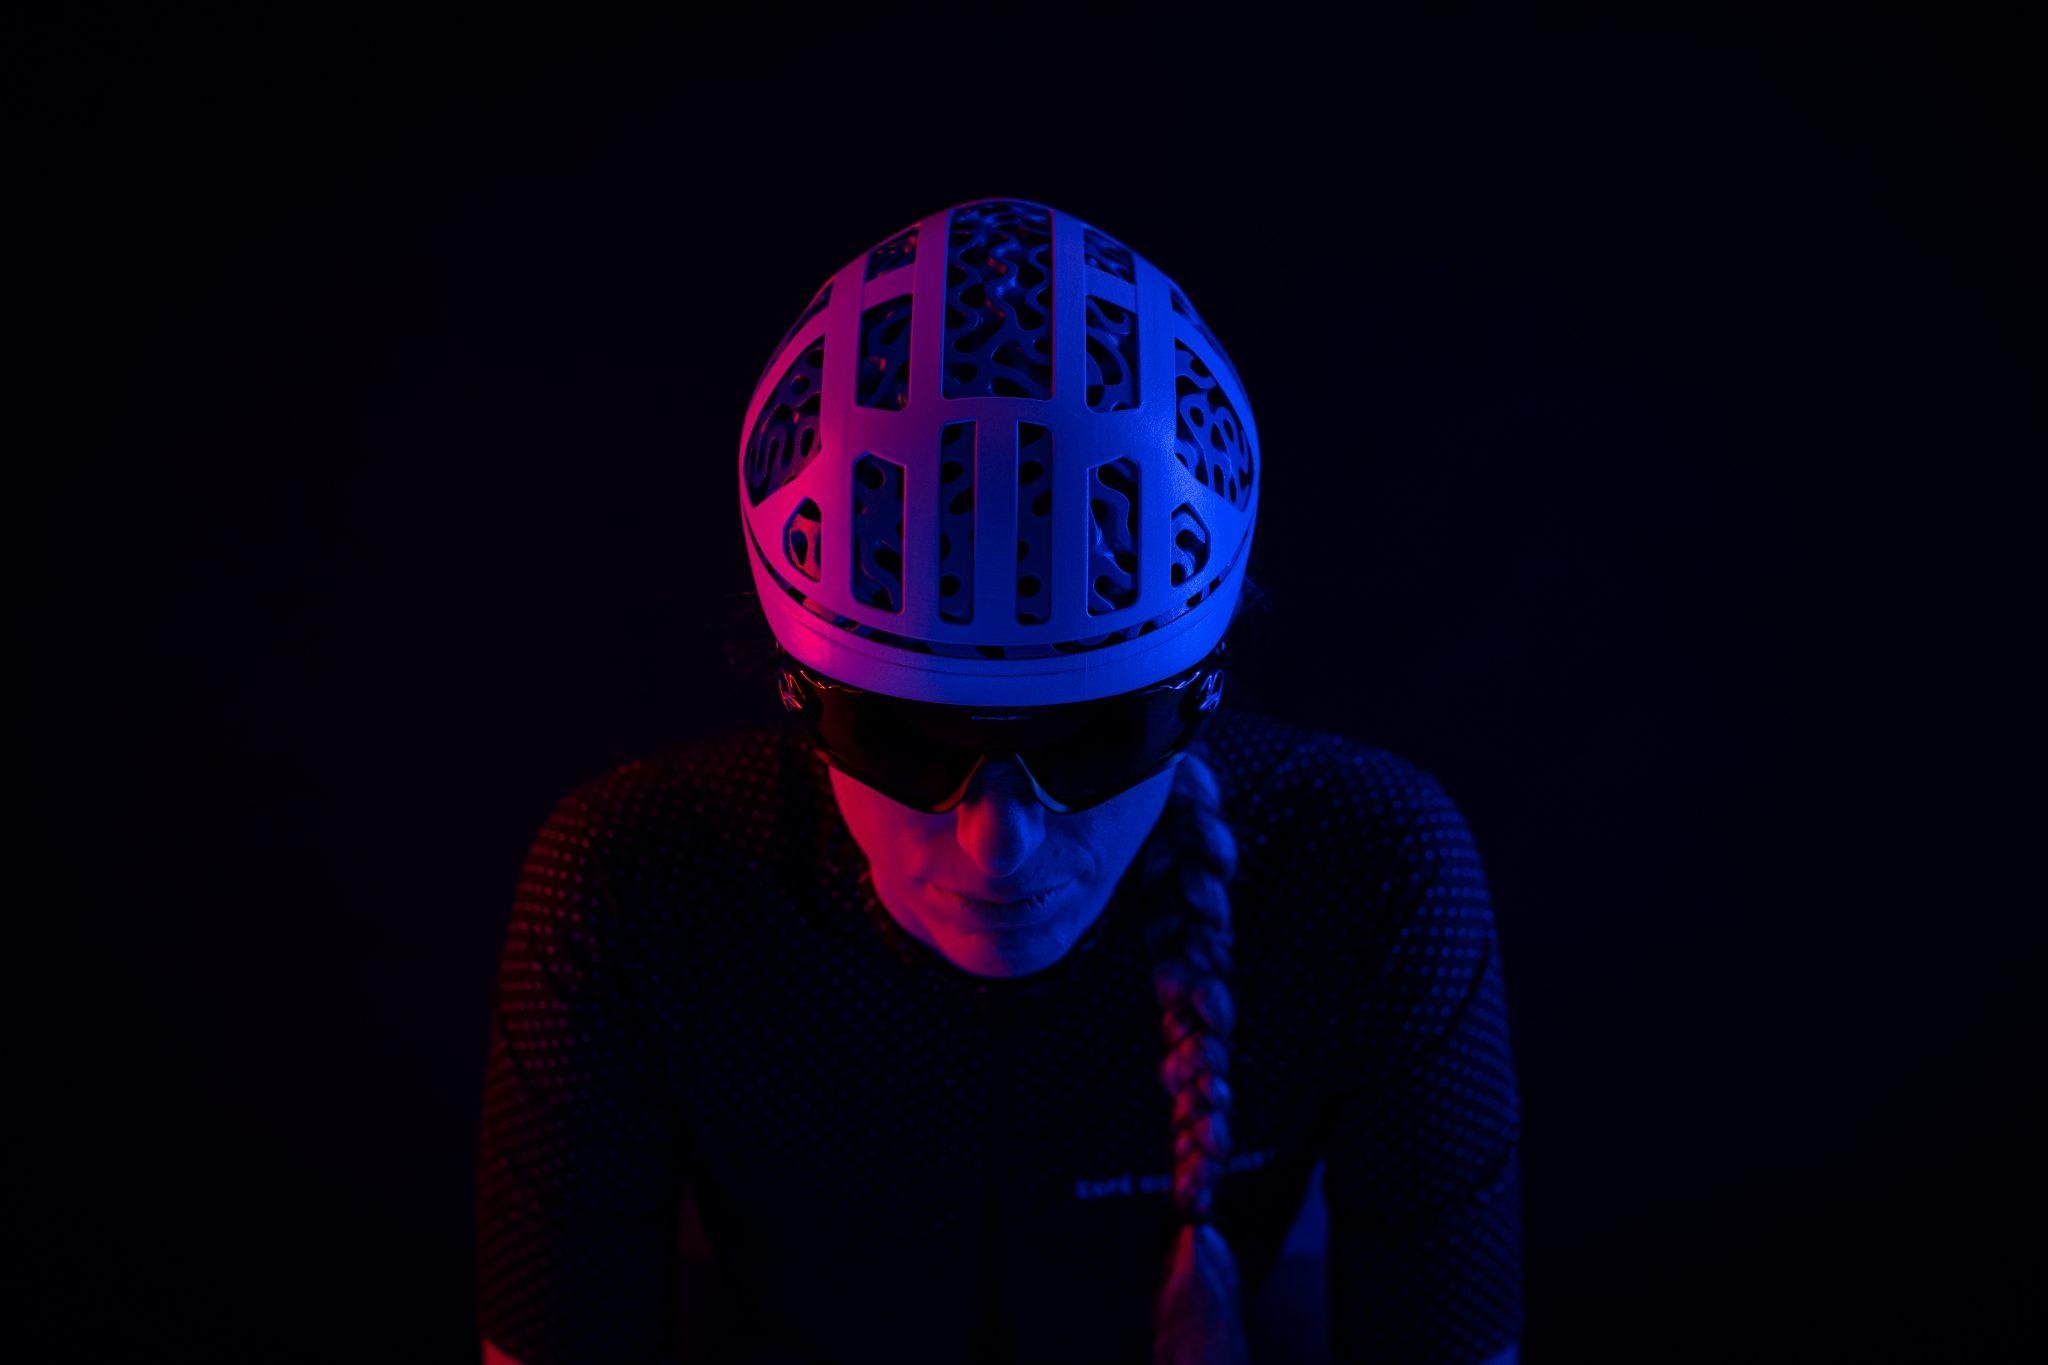 A bike helmet designed by Hyperganics.